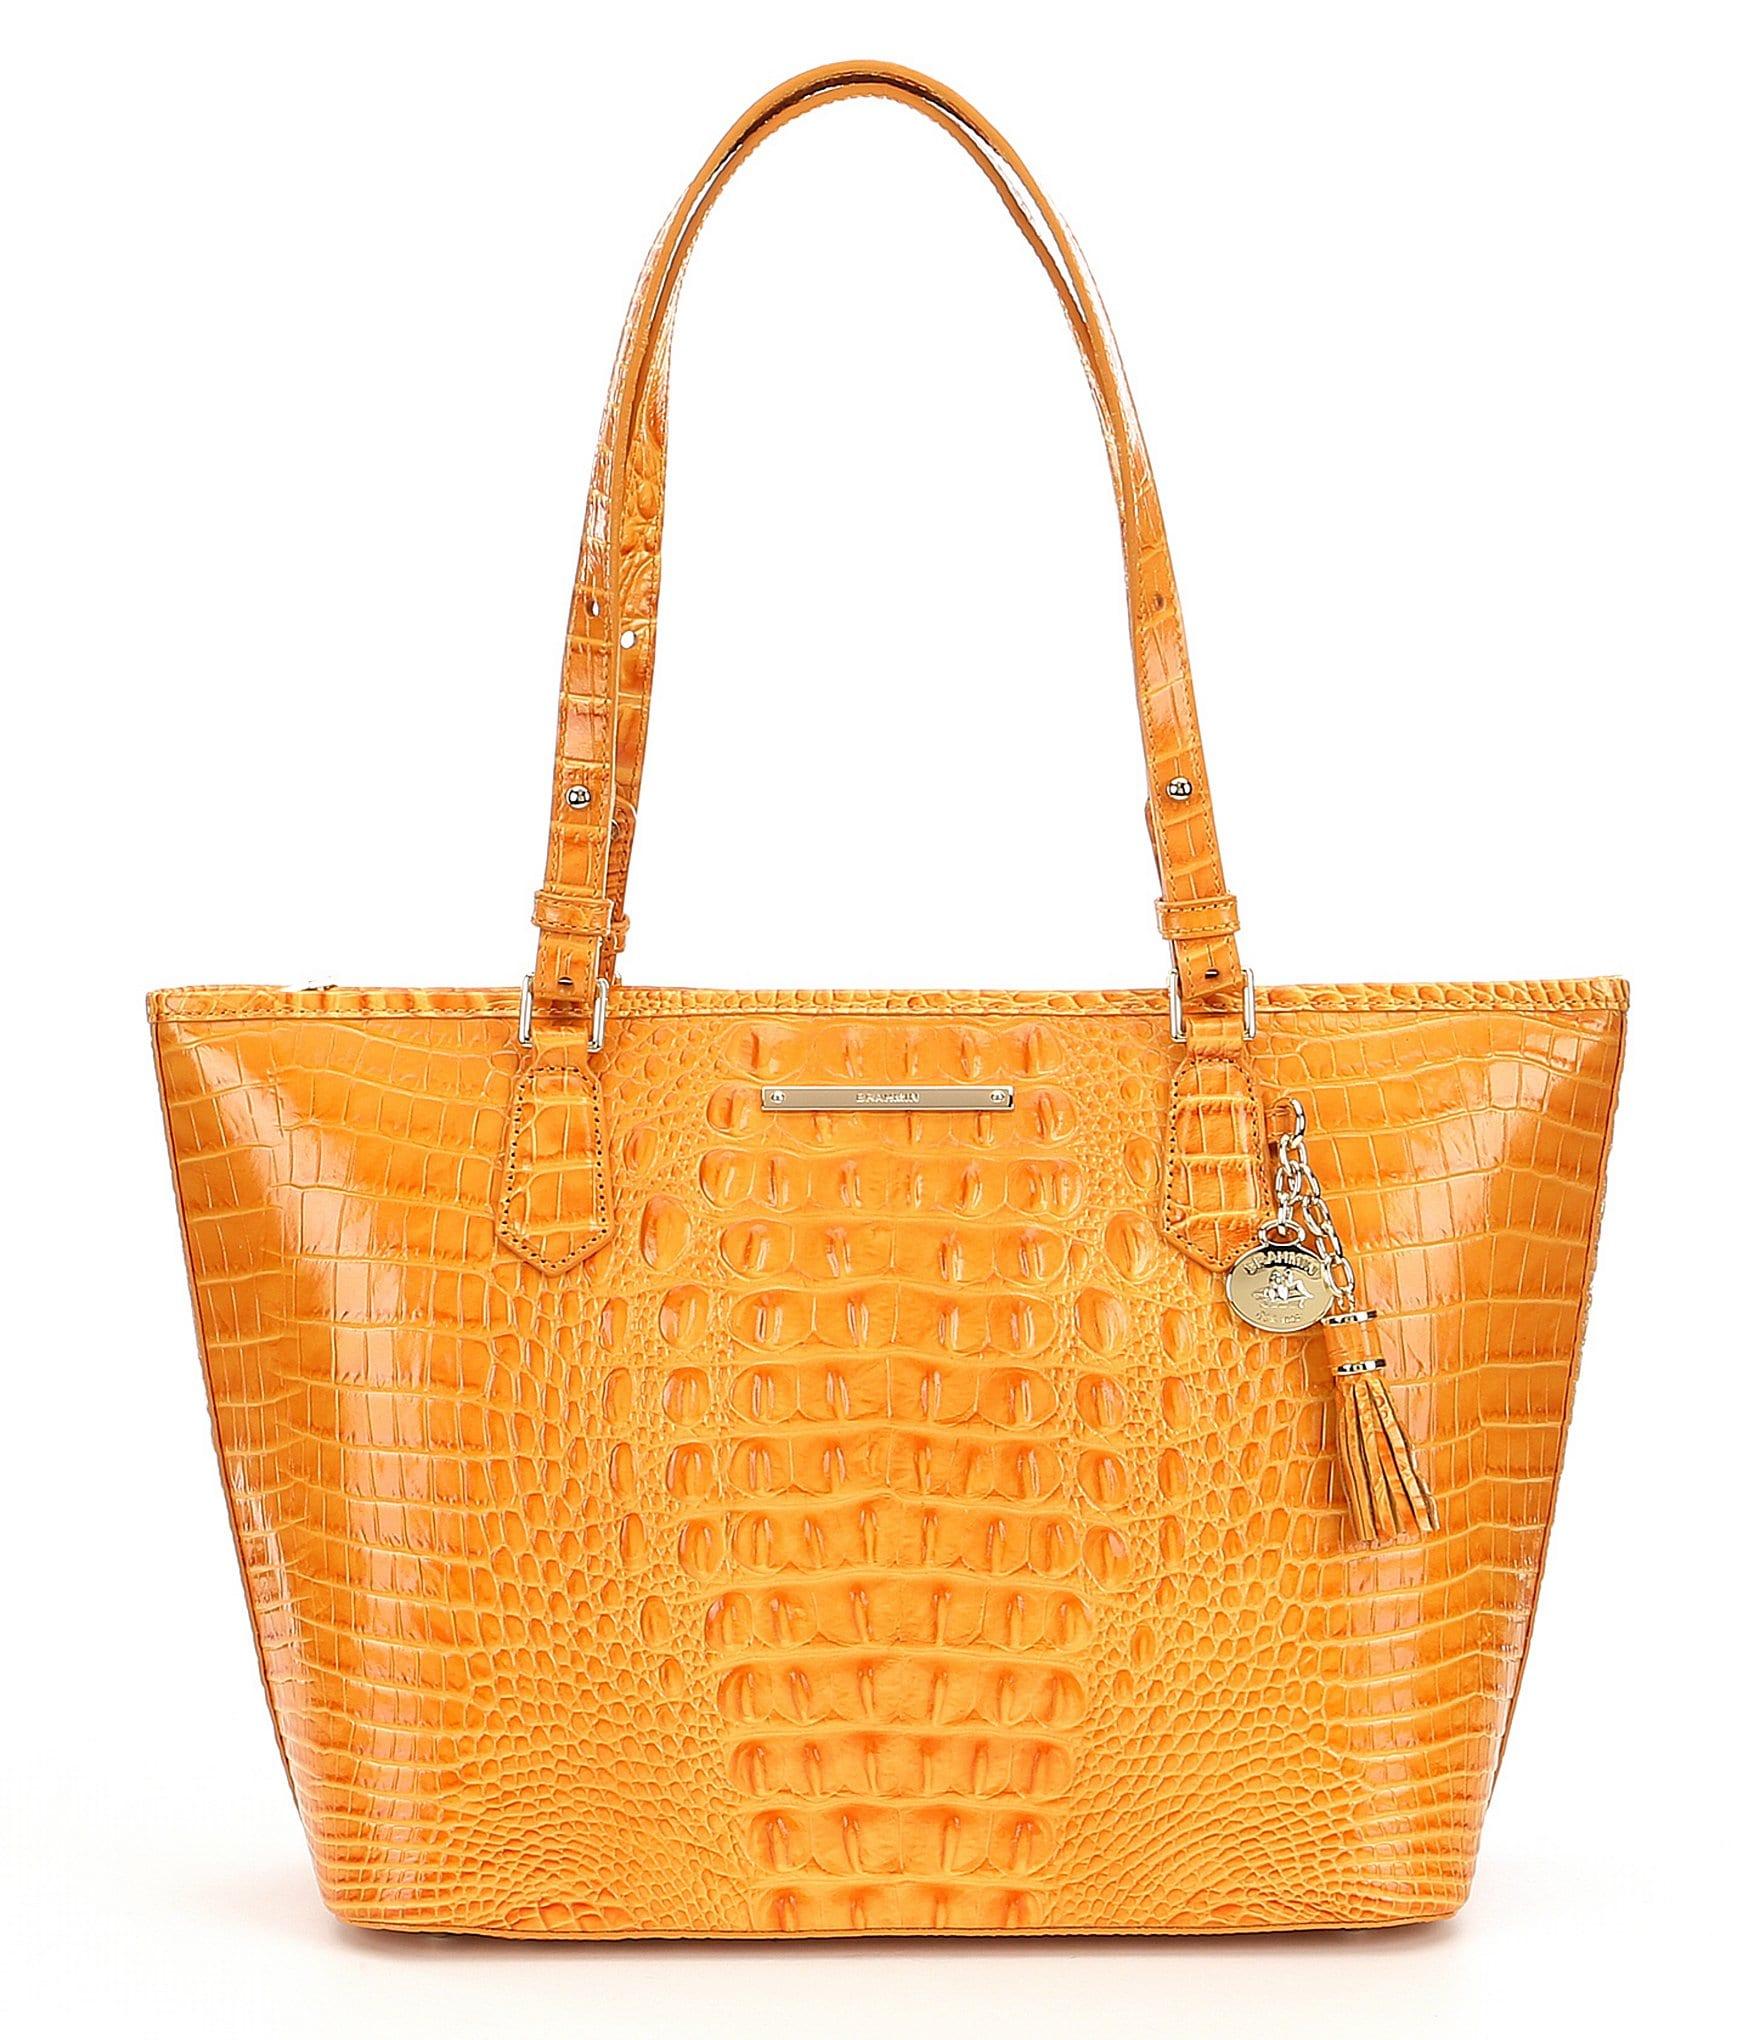 Brahmin Handbags Dillards Clearance Jaguar Clubs Of